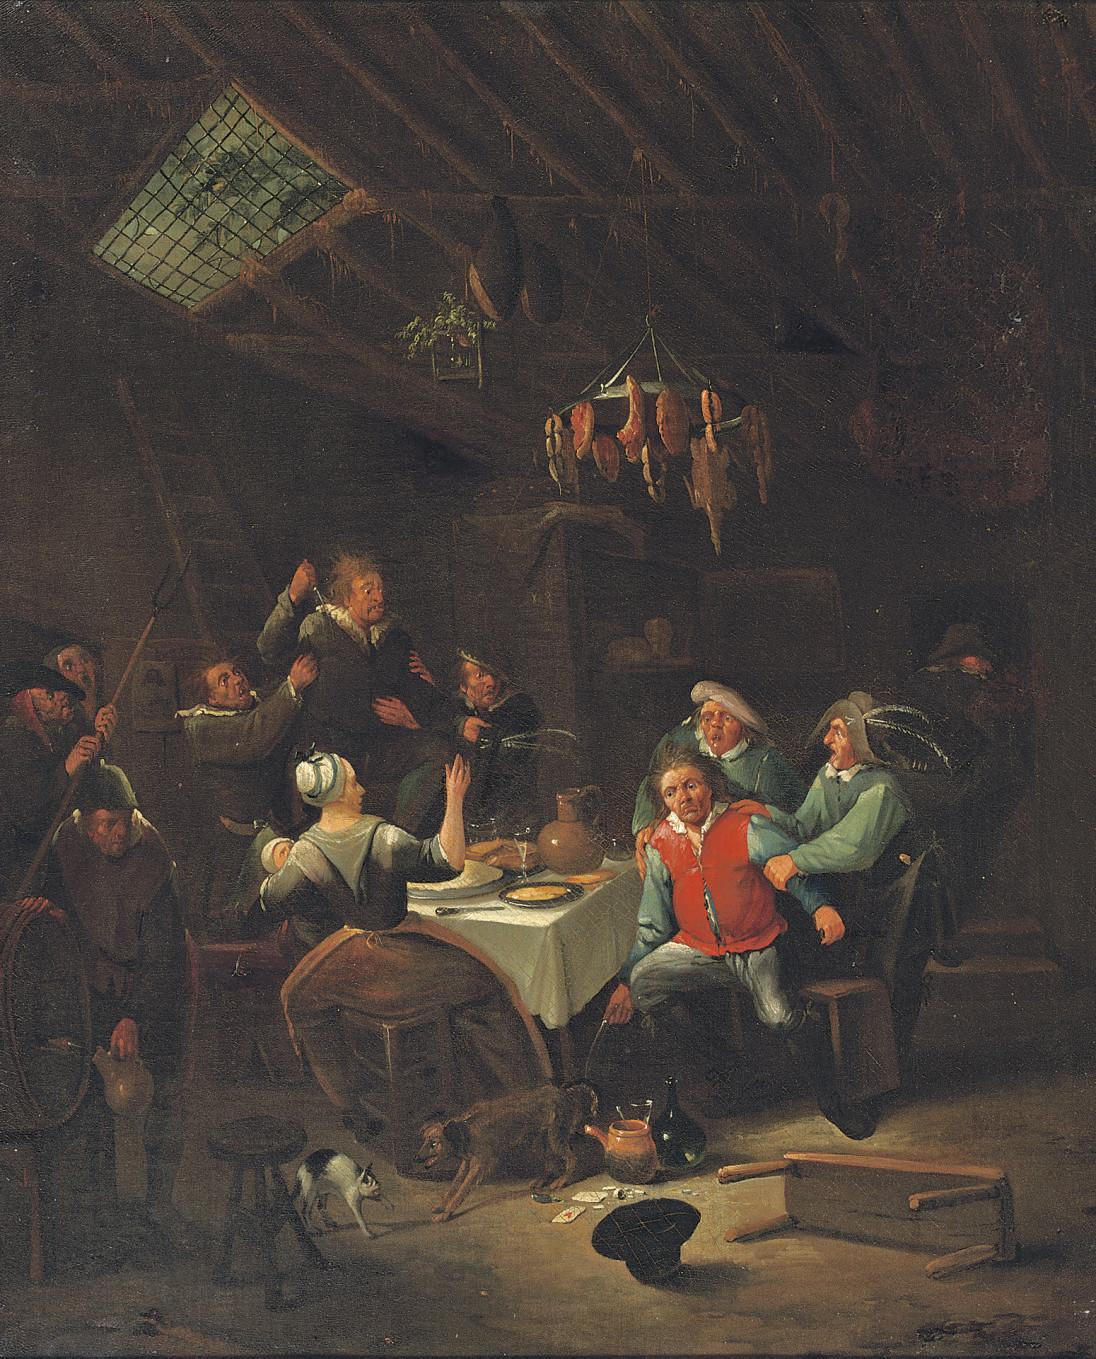 A peasant brawl in an interior